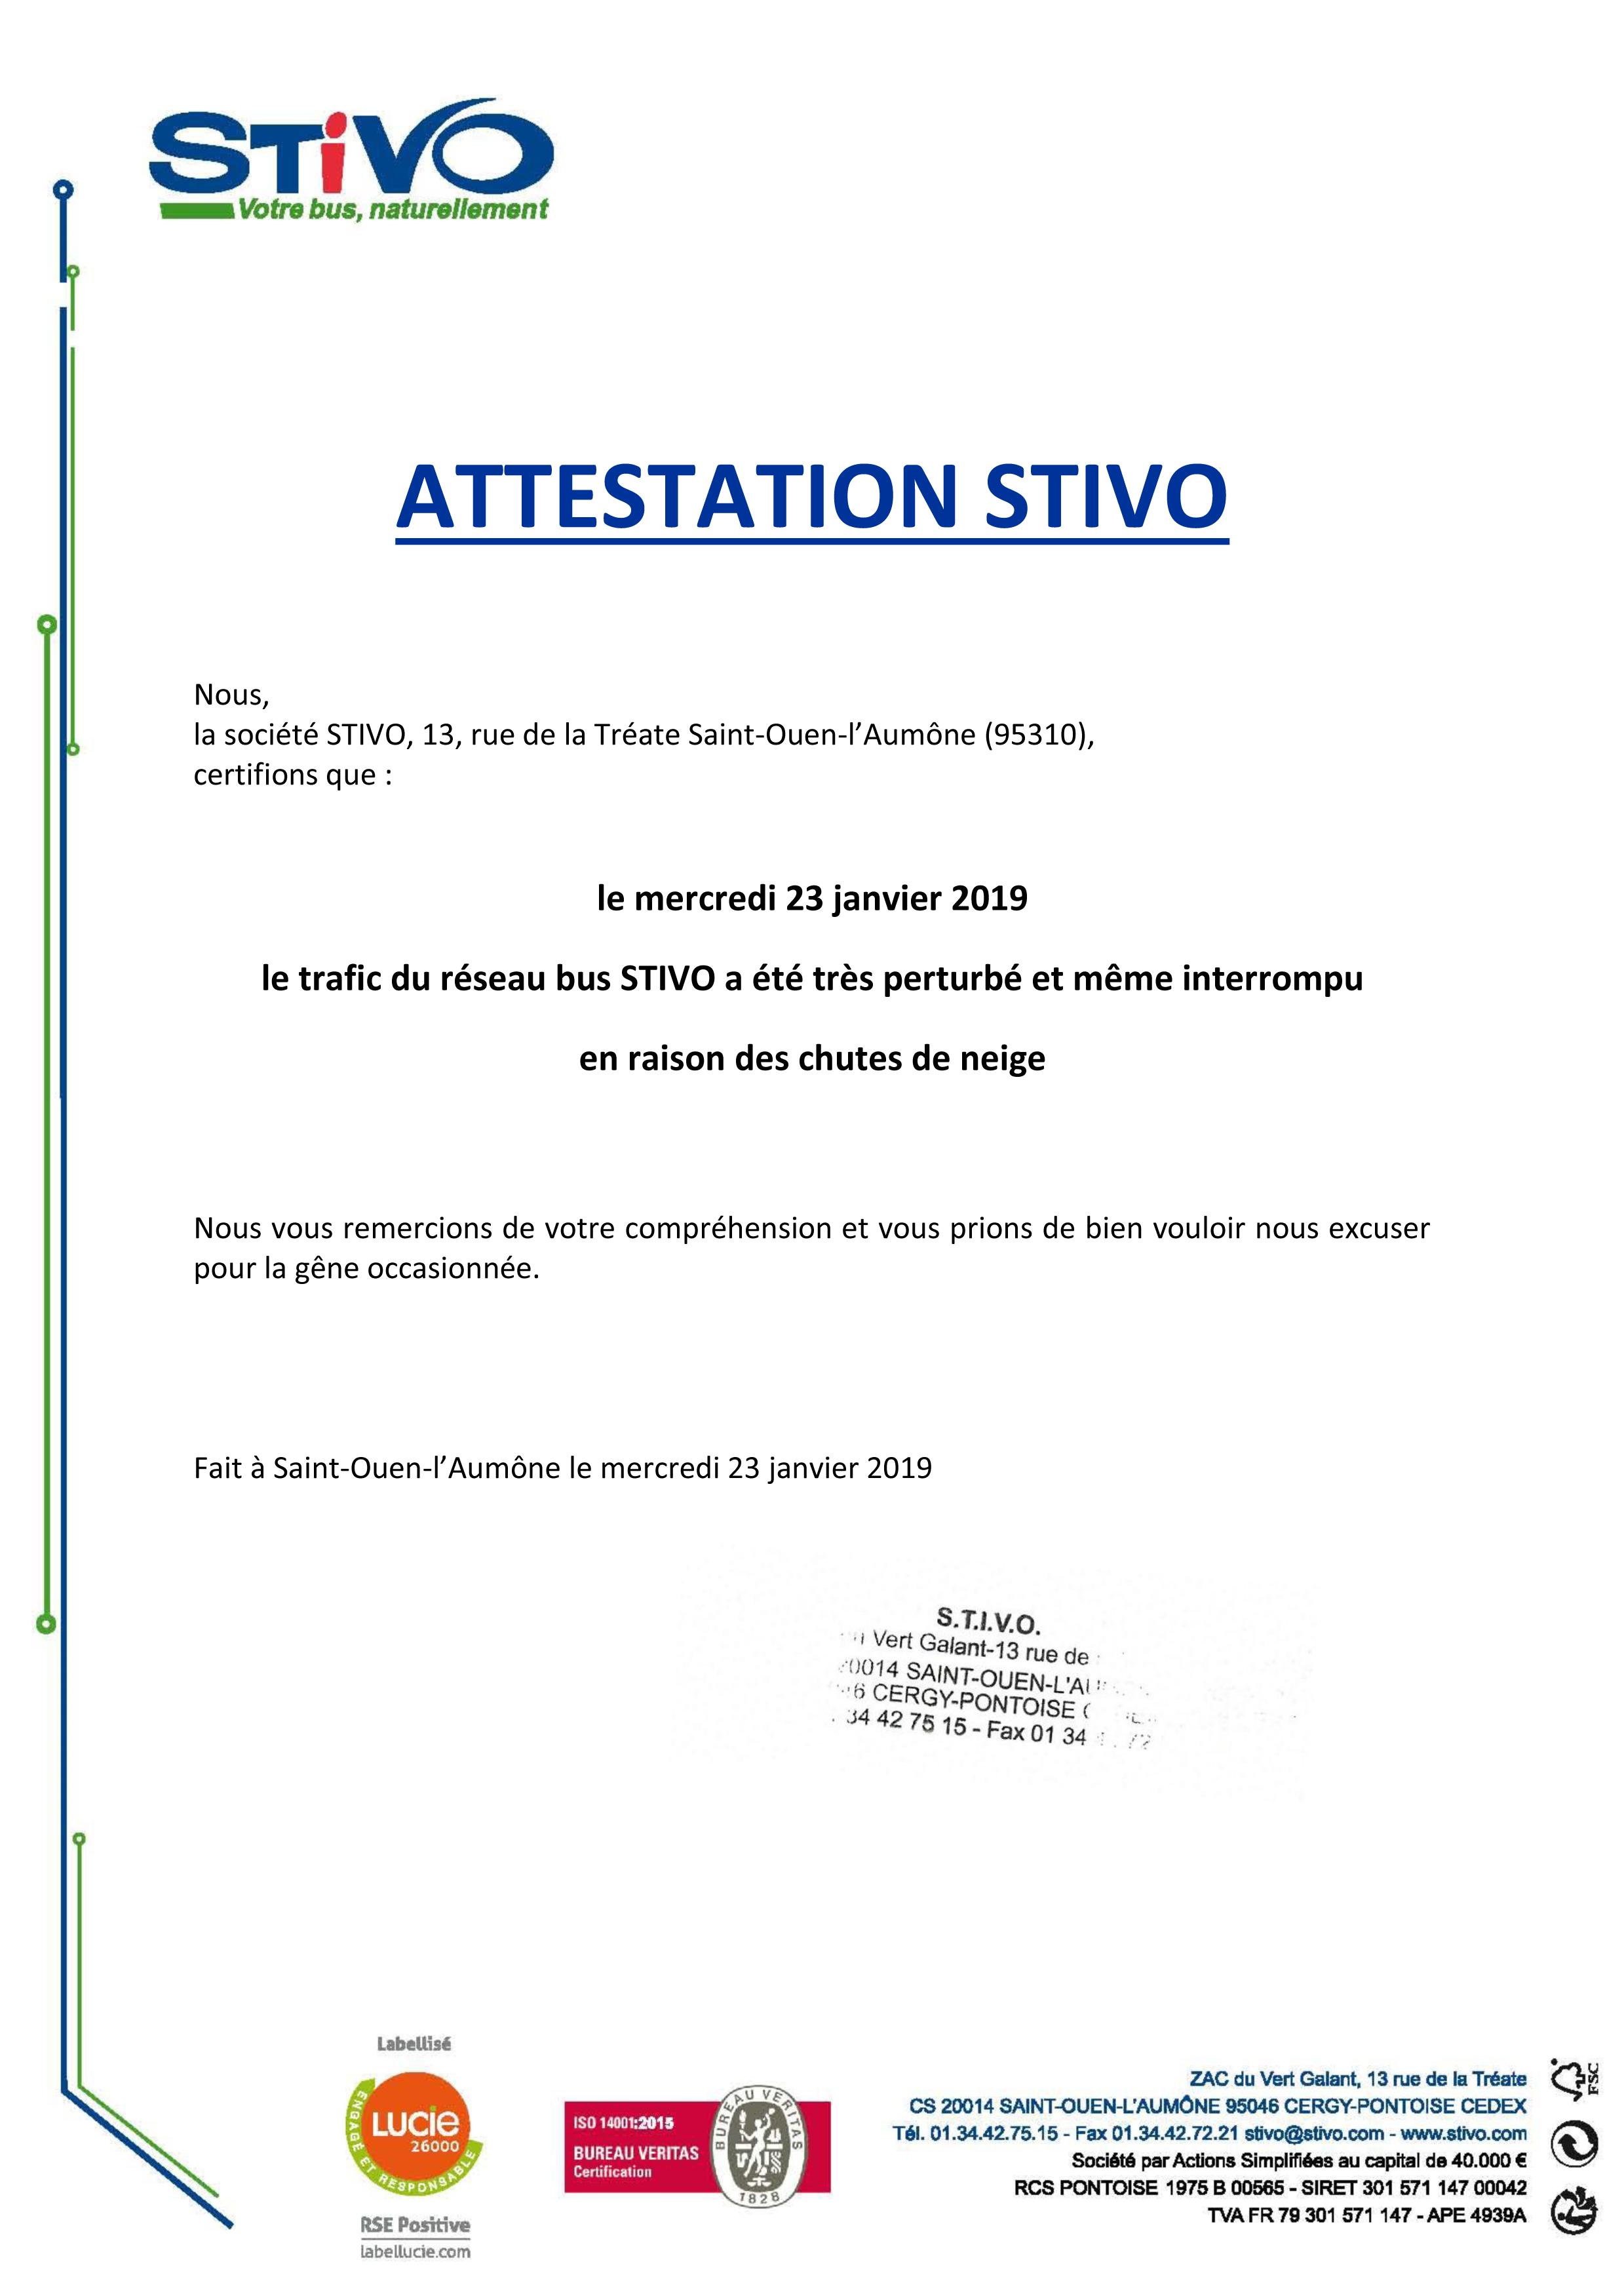 Attestation STIVO 23.01.2019